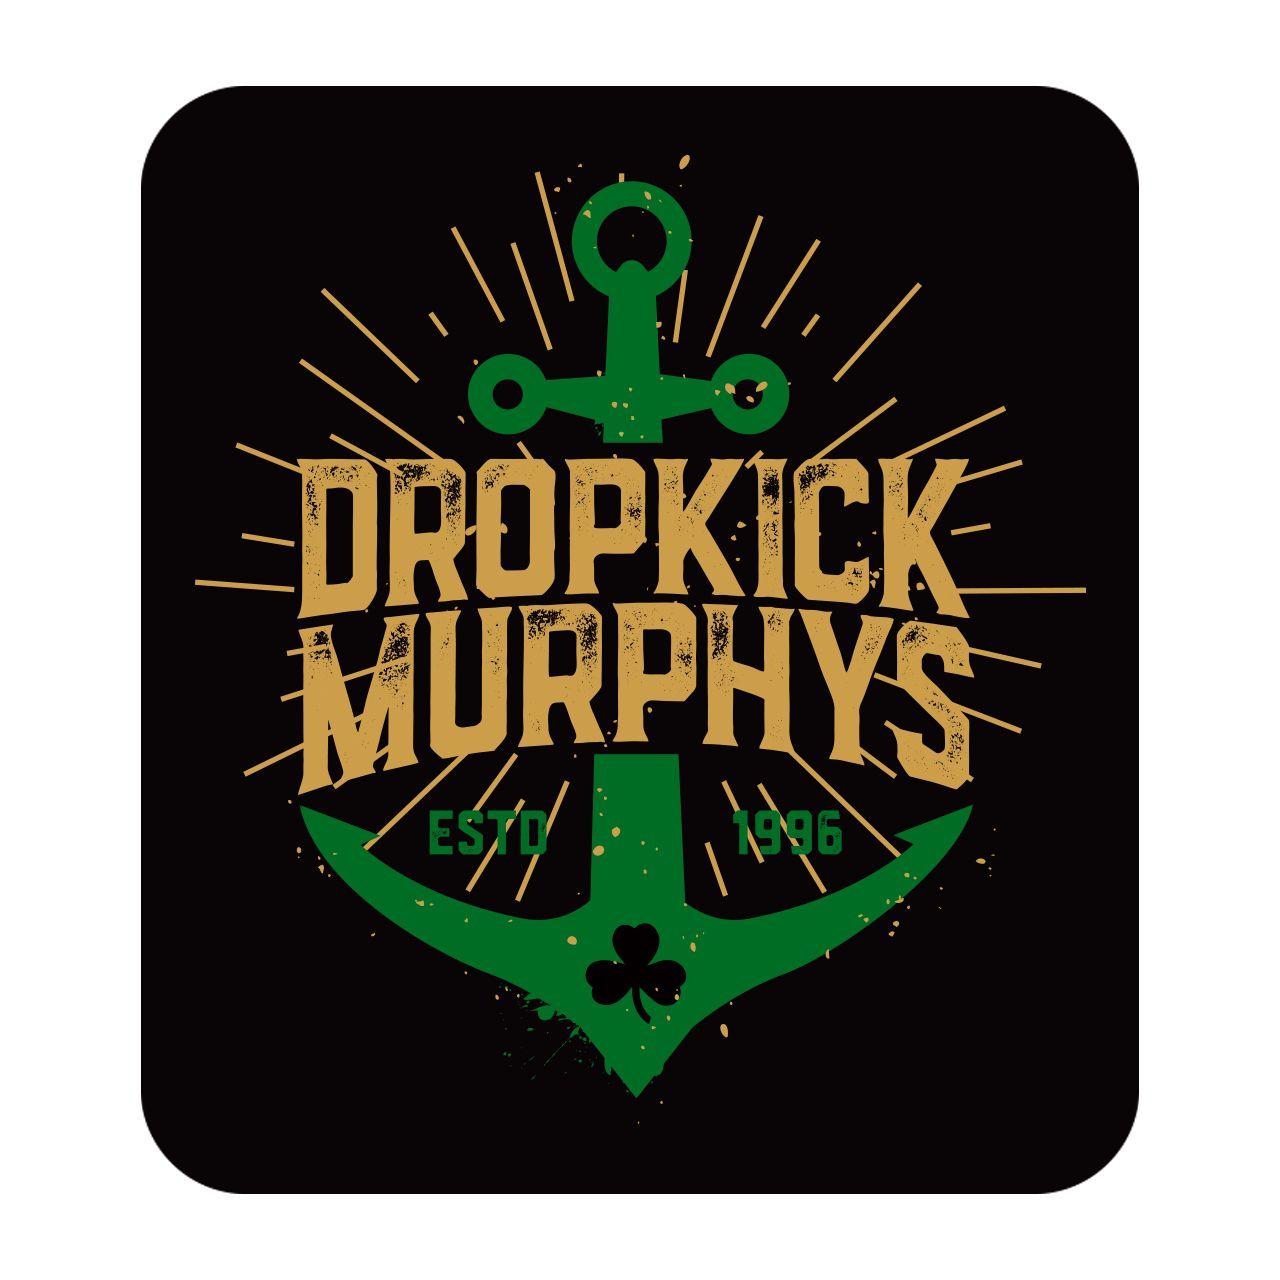 Dropkick Murphys - Anchor